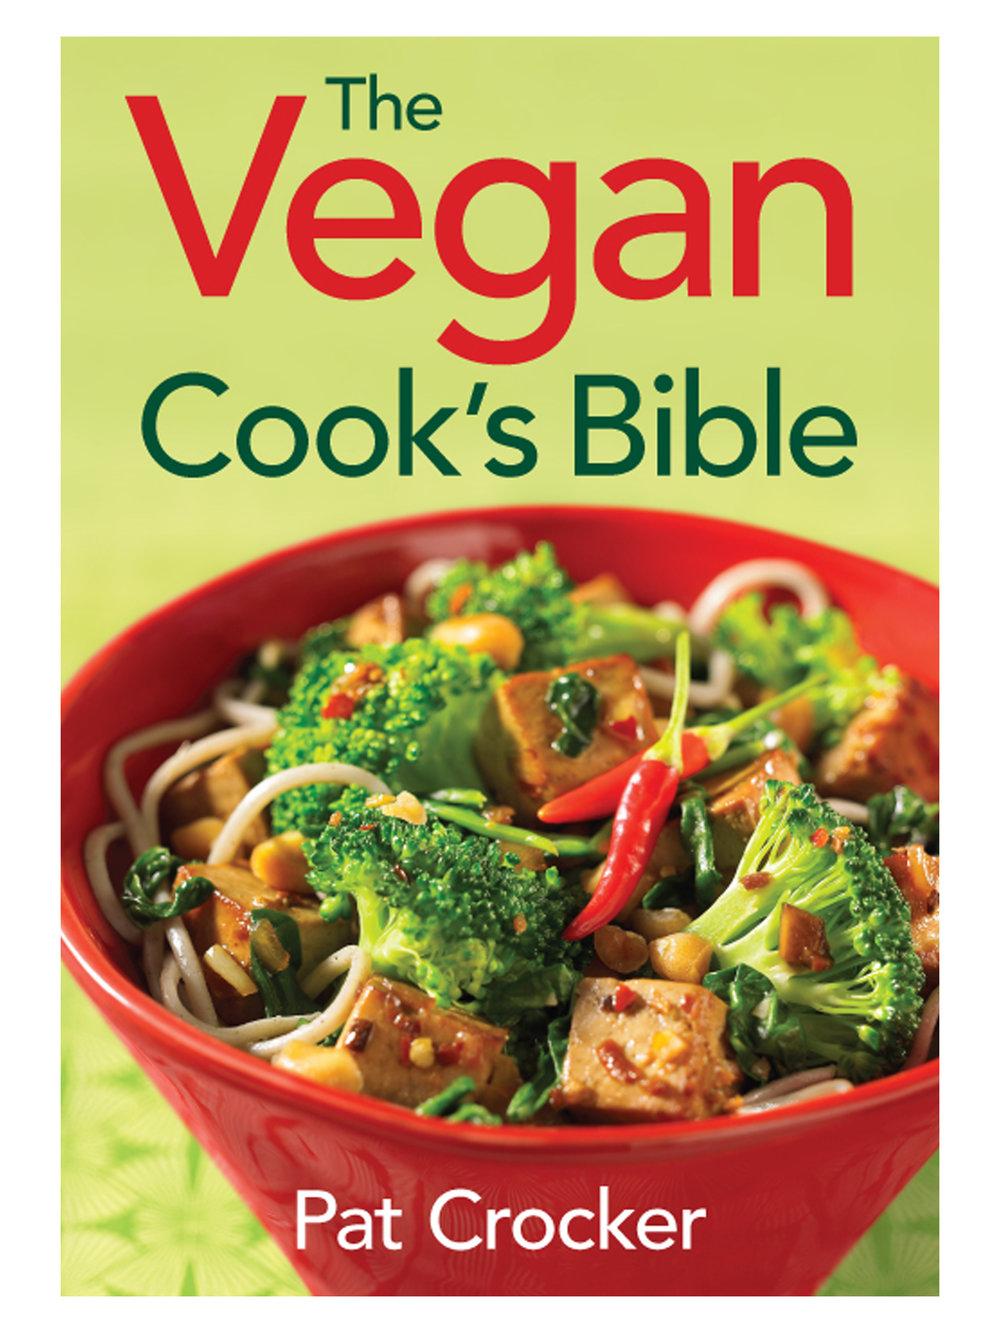 The Vegan Cook's Bible by Pat Crocker